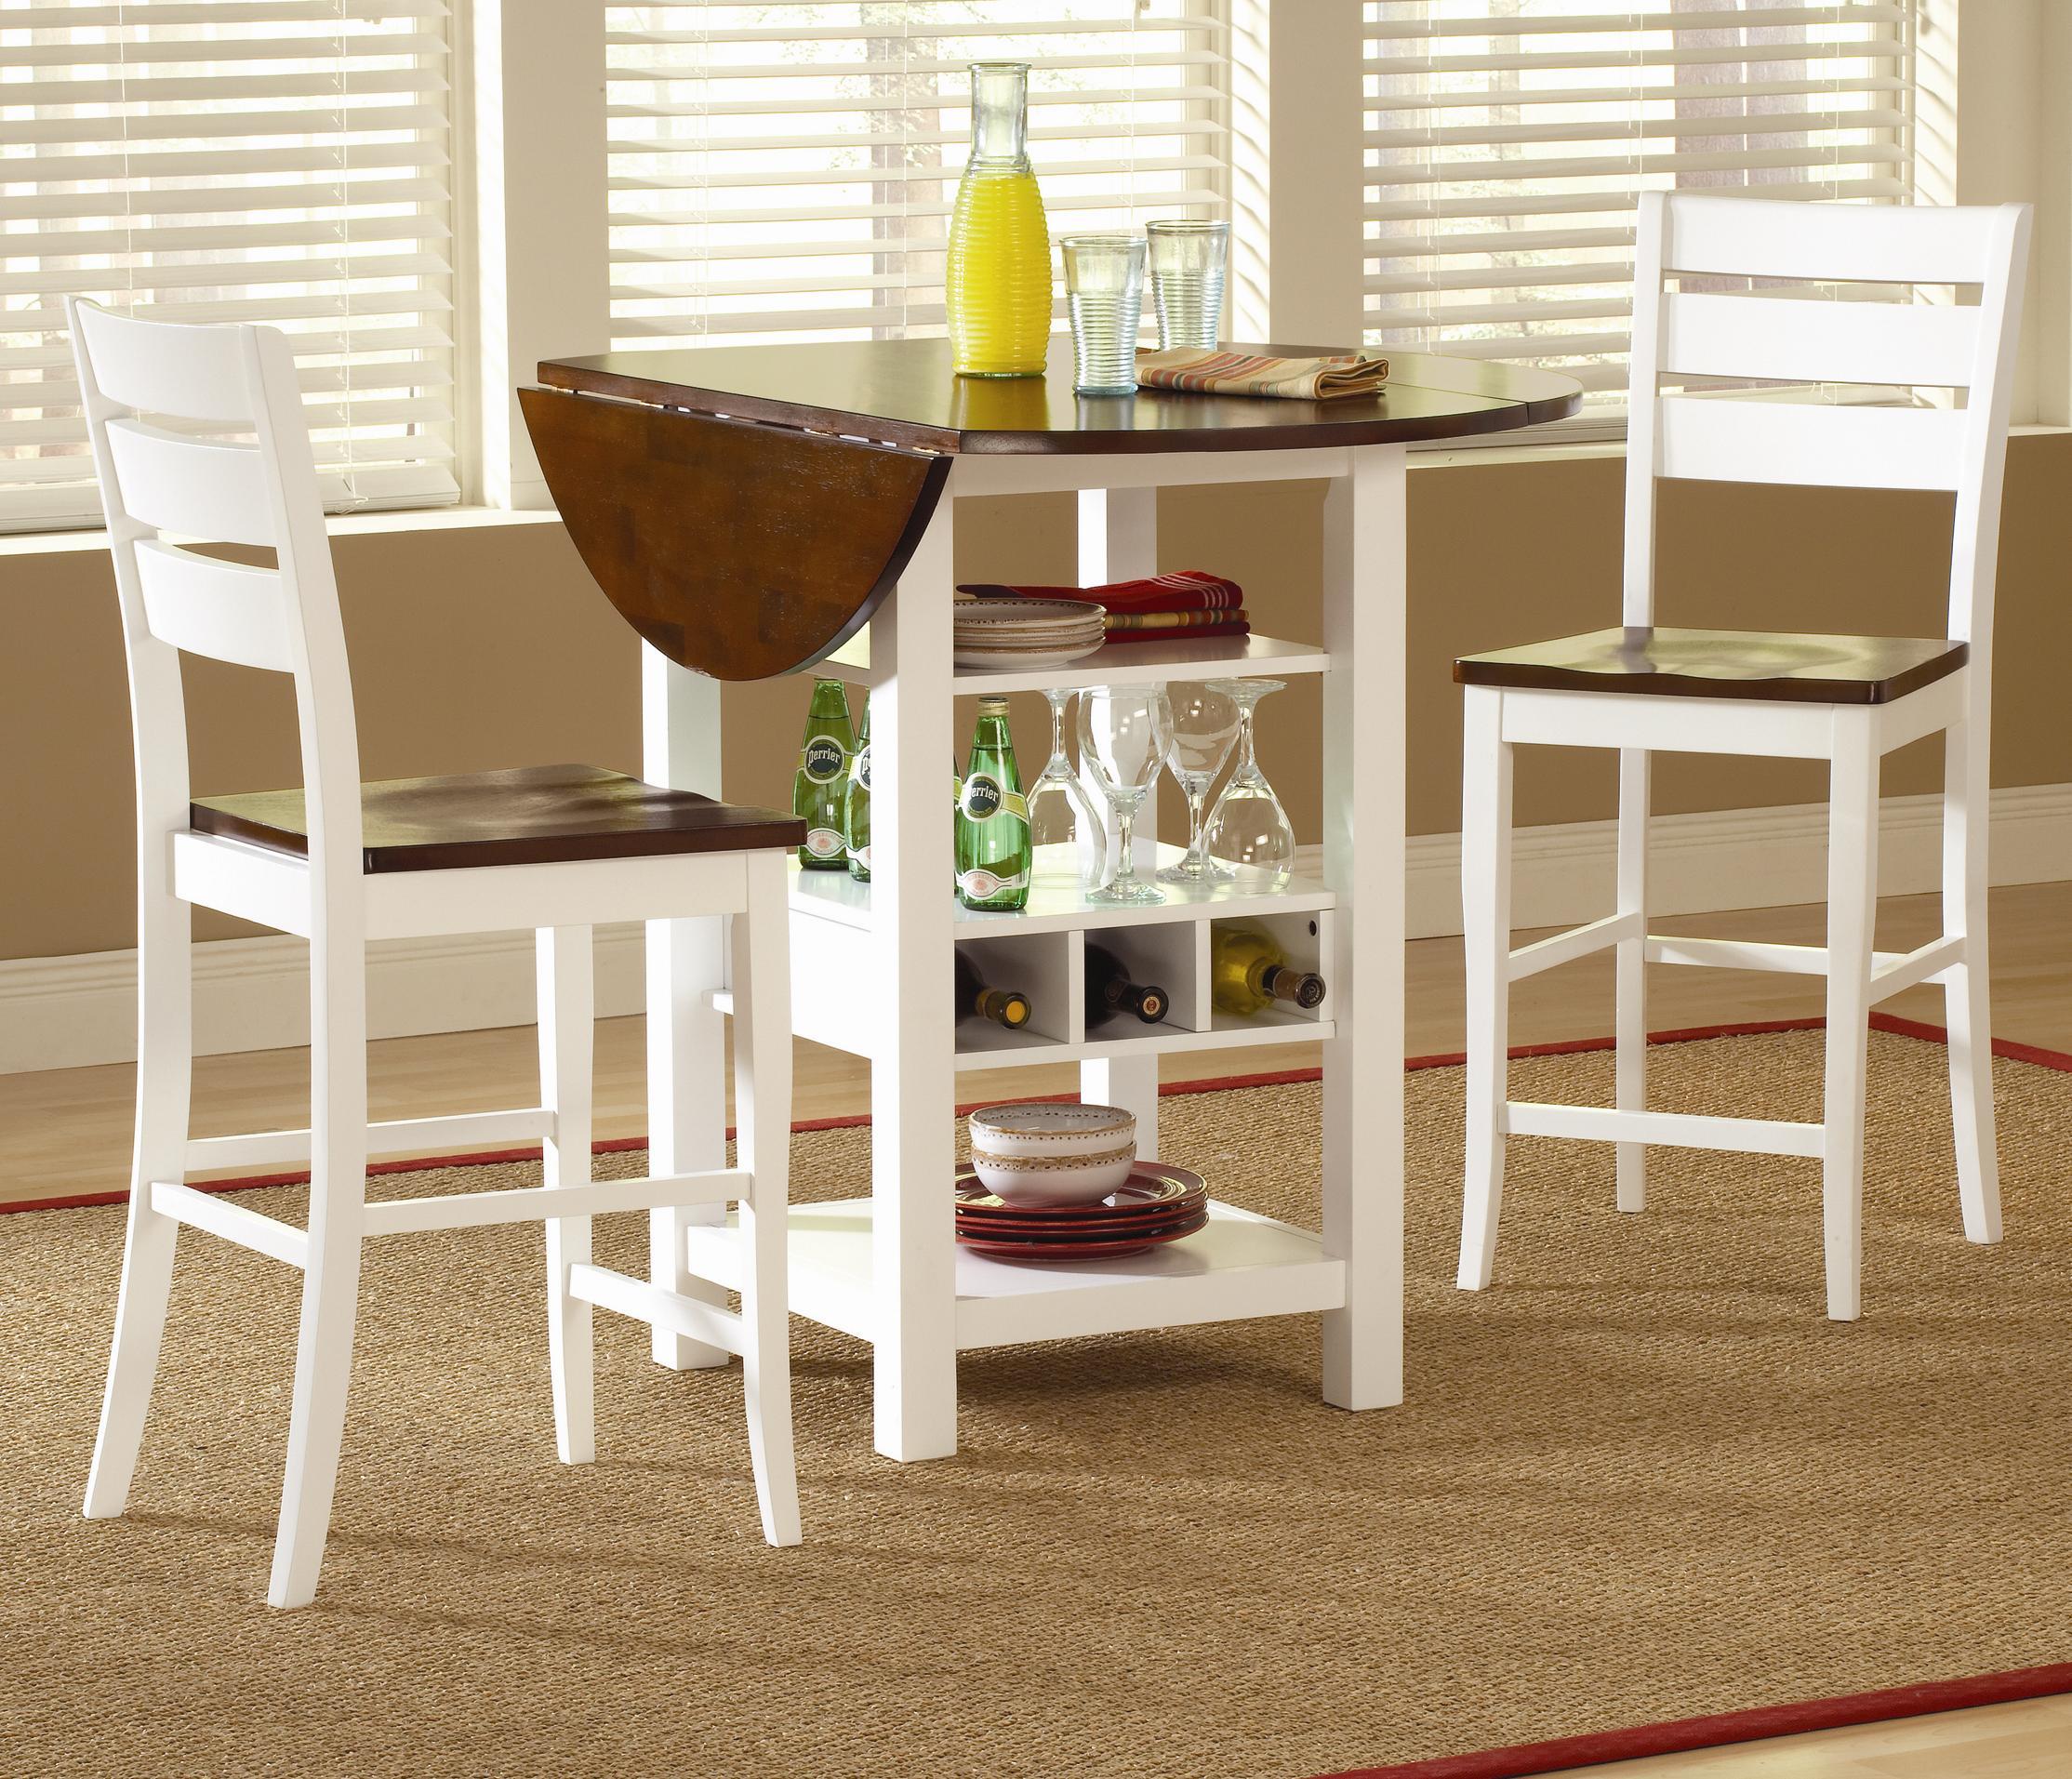 Bernards Ridgewood 3 Piece Drop Leaf Pub Table Set & Bernards Ridgewood 3 Piece Drop Leaf Pub Table Set   Wayside ...